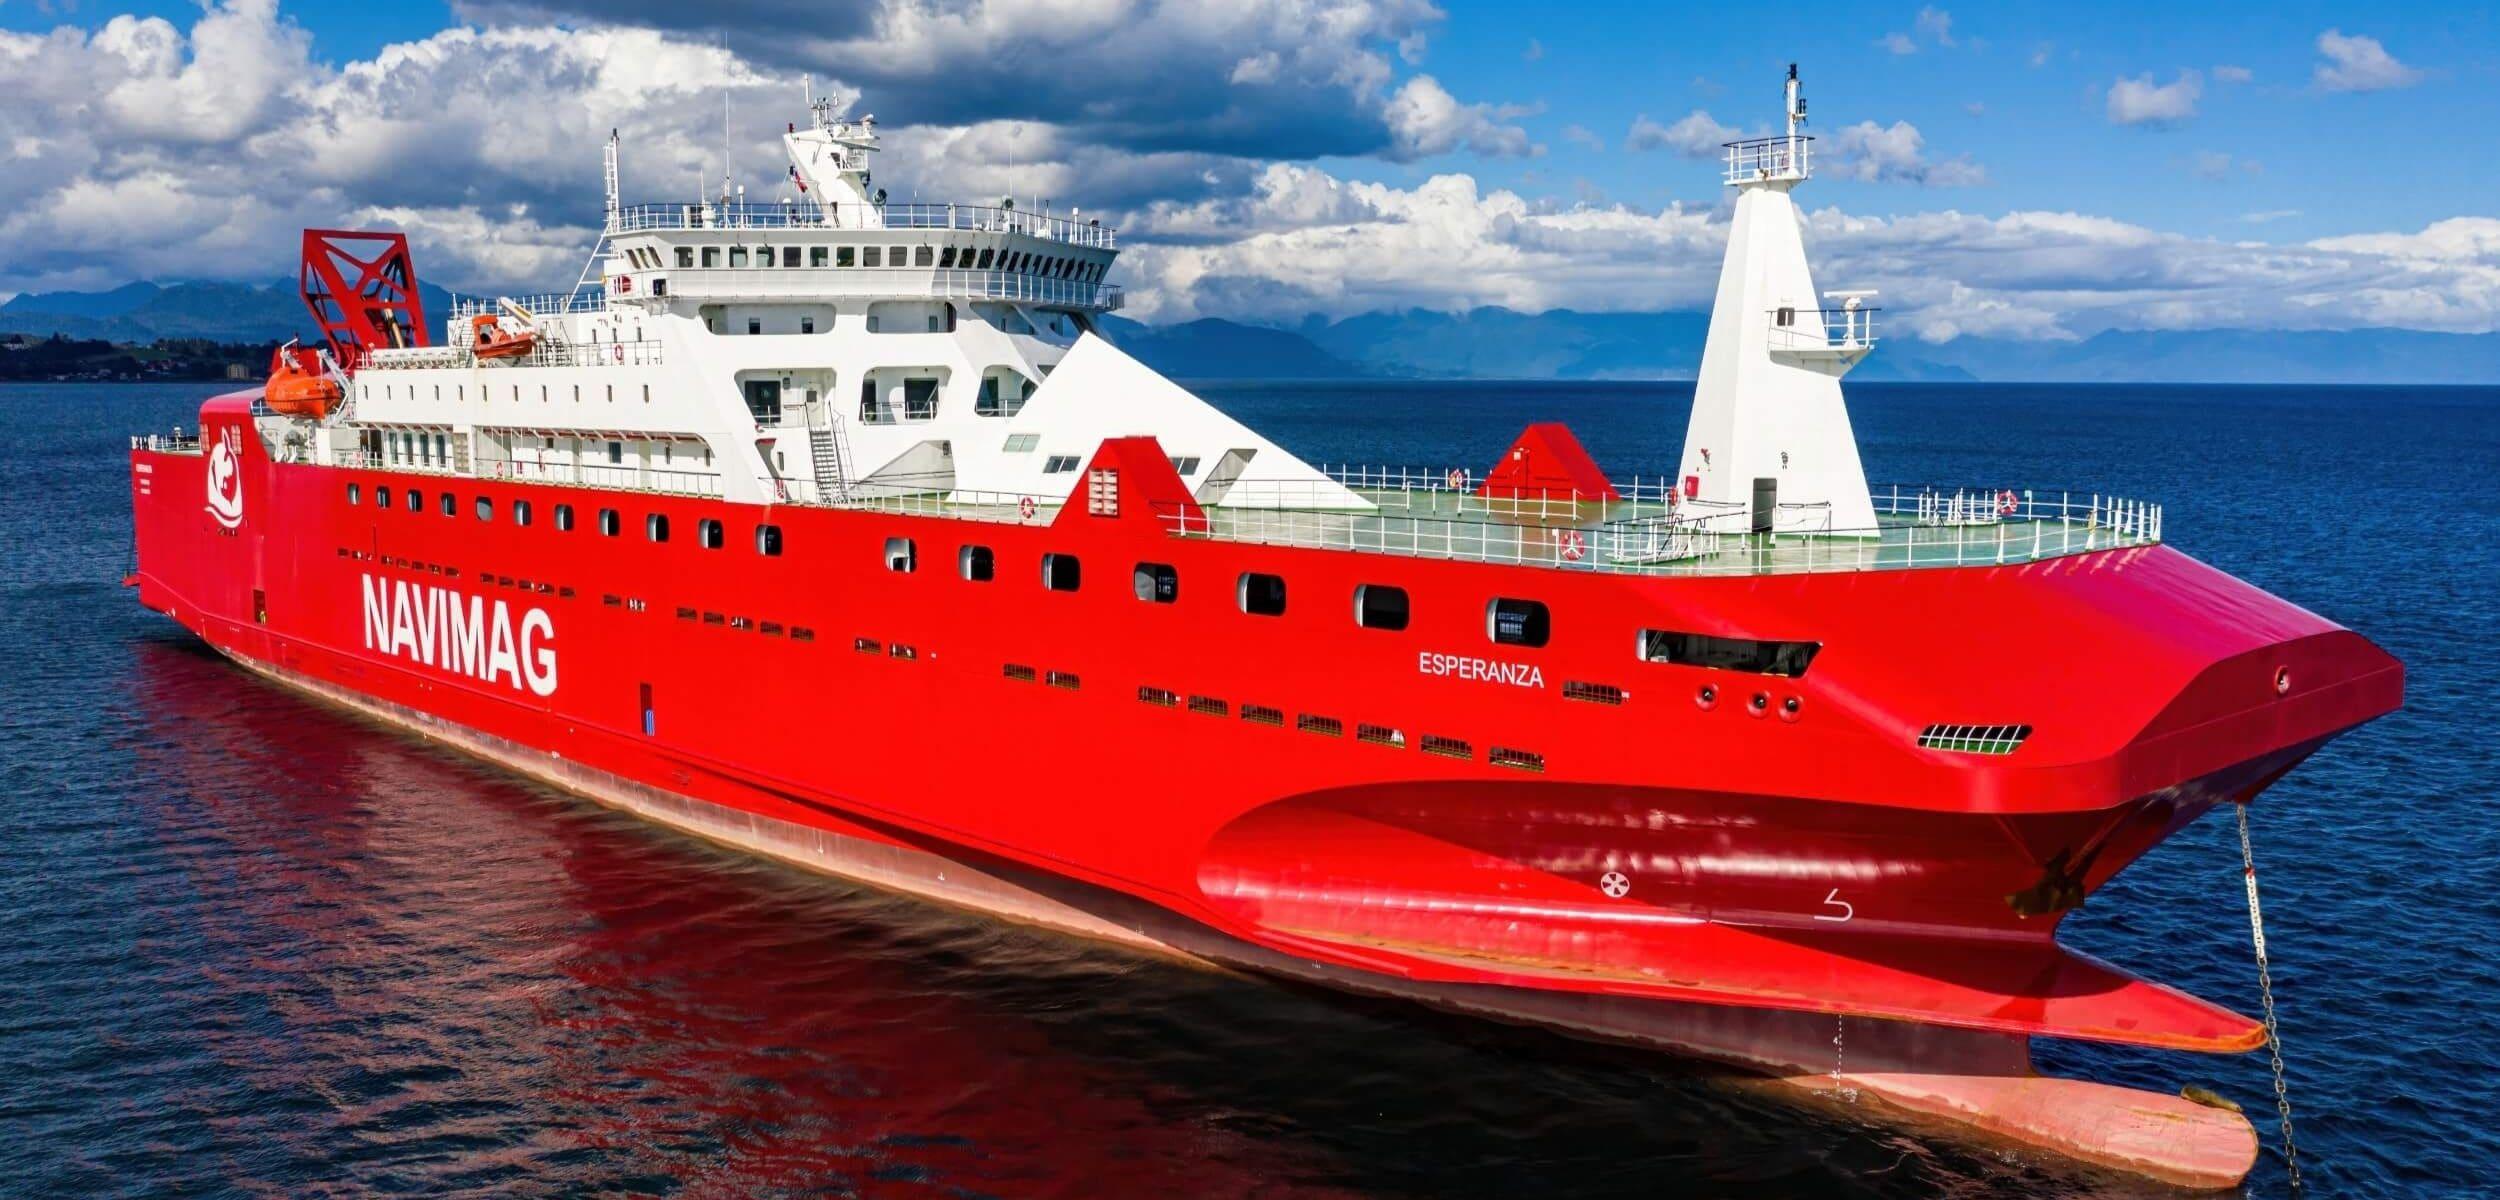 ferry-esperanza-navimag